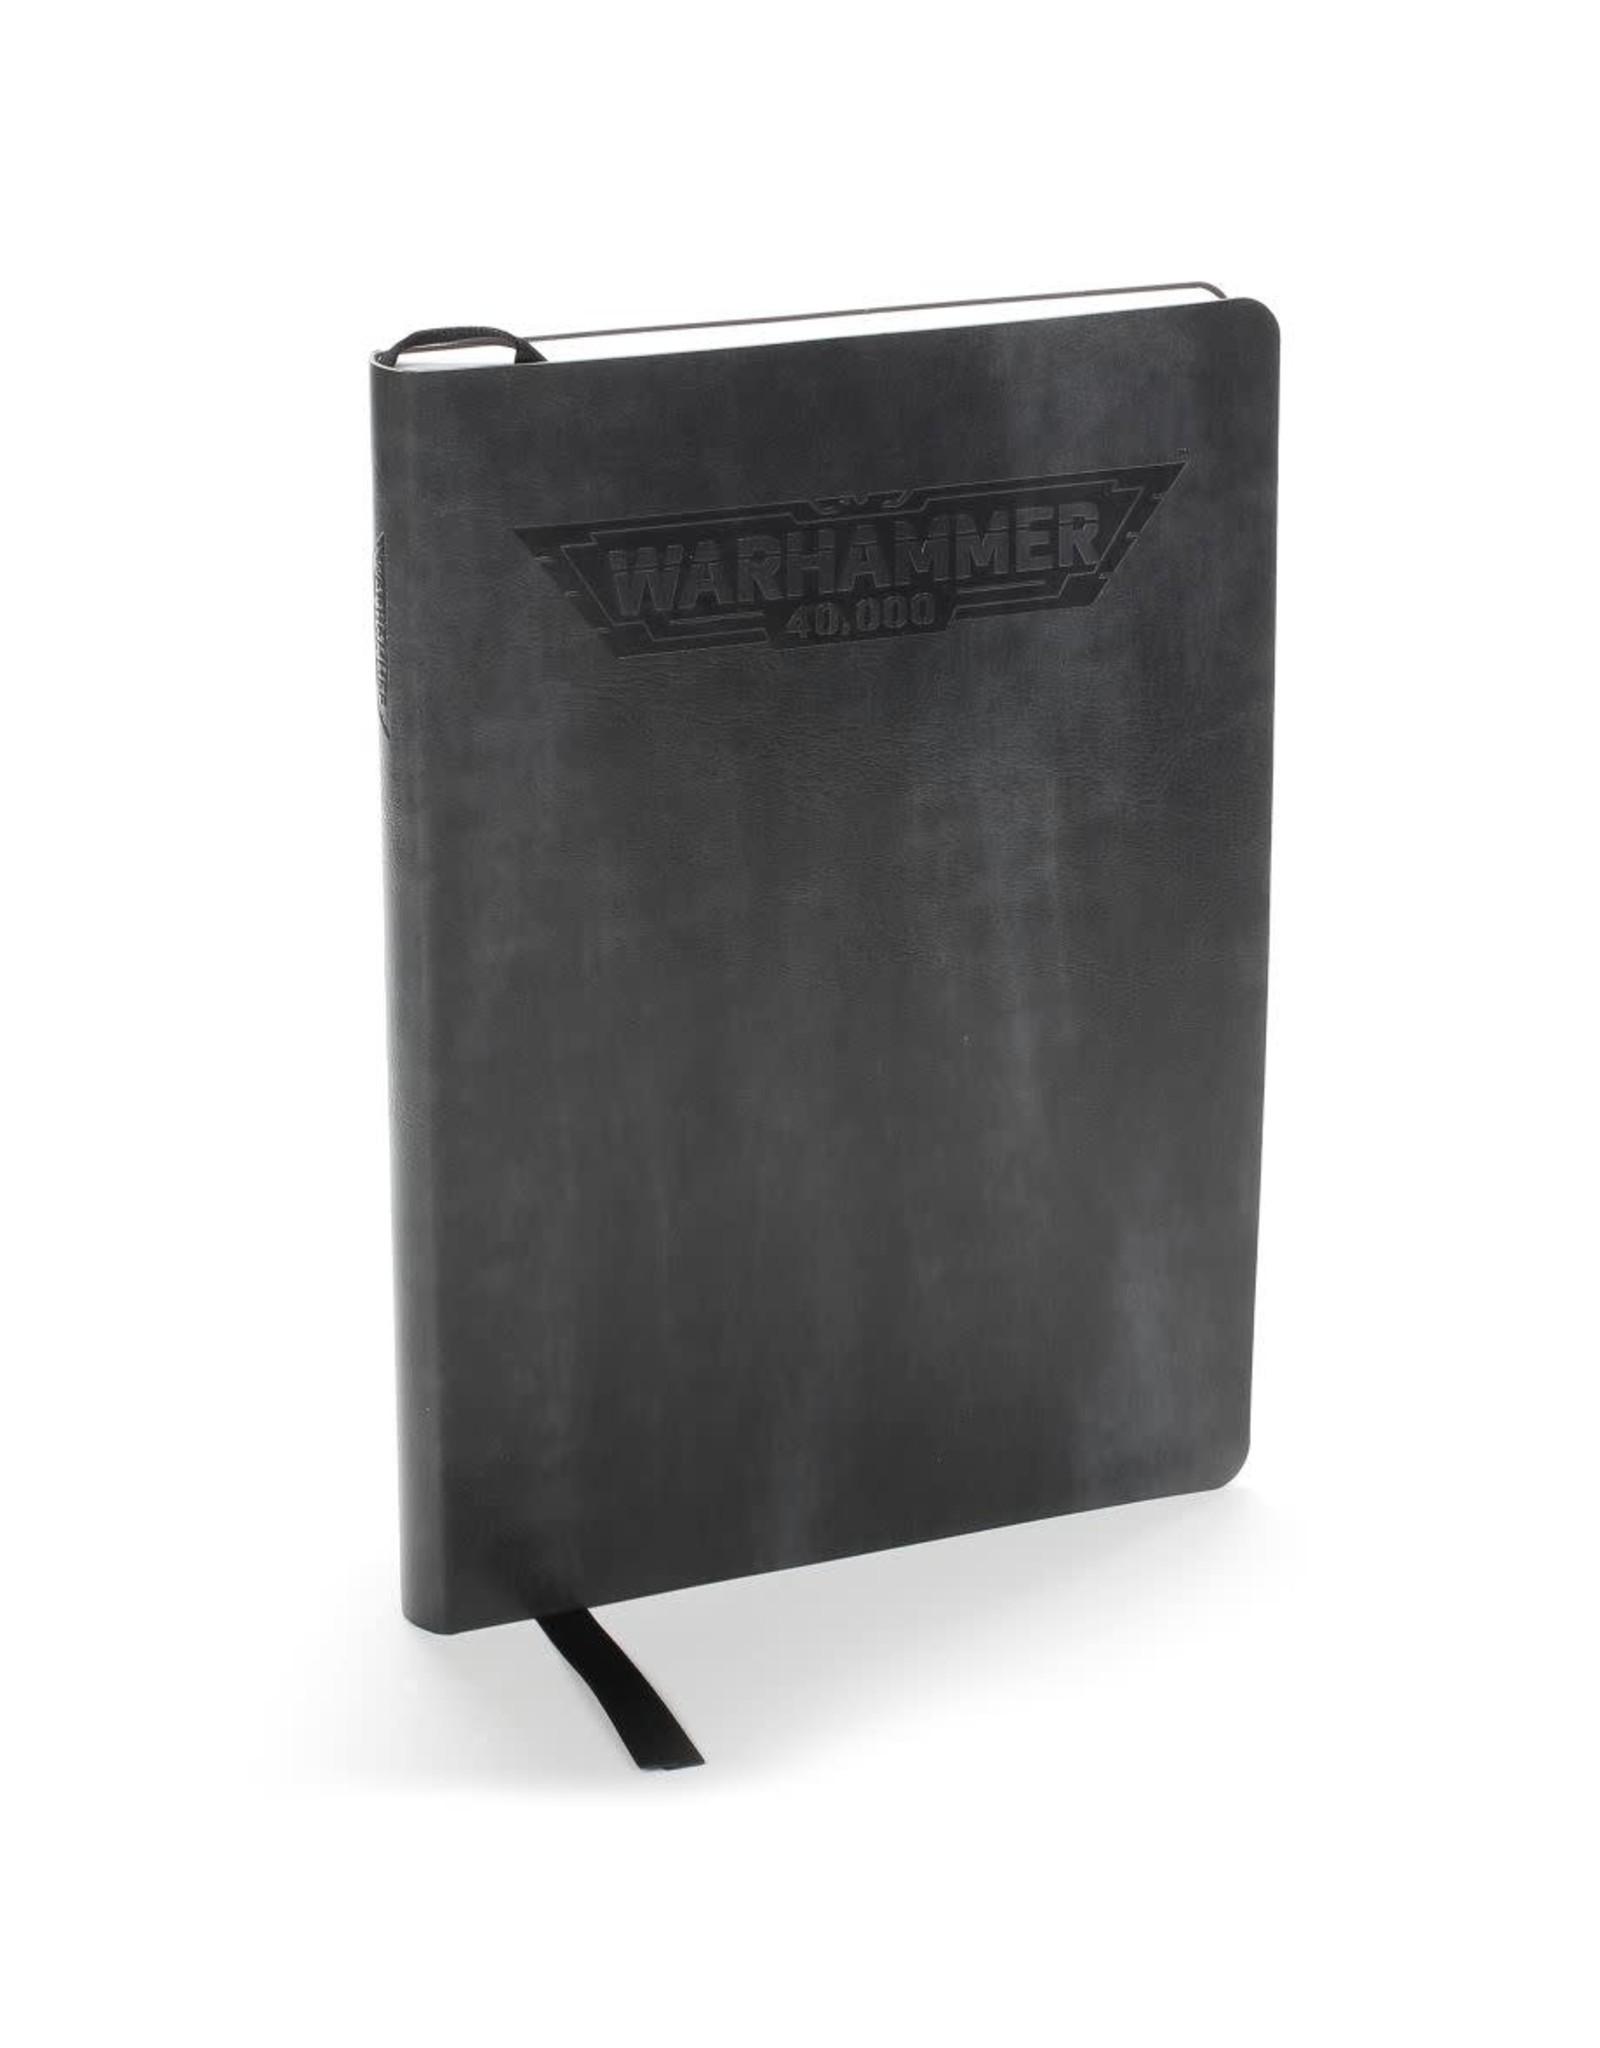 Citadel Warhammer 40,000 Battle Journal